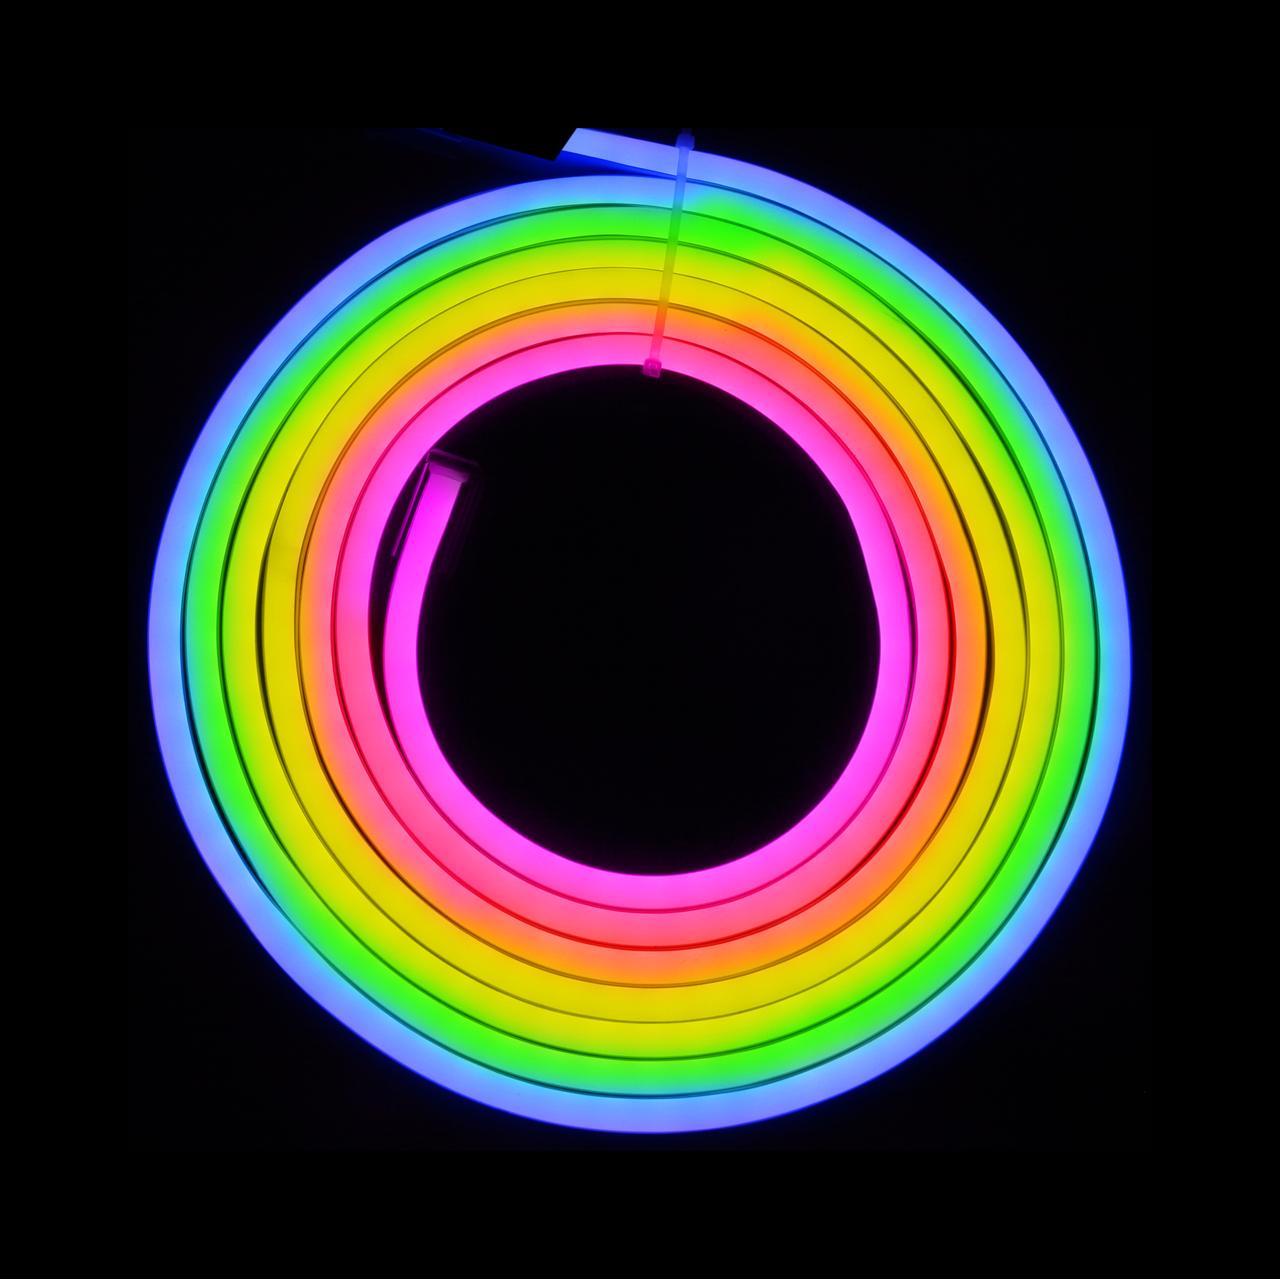 Уличный светодиодный шнур Неон-Флекс Lumion Neon-Flex 8х16 мм 92 LED/м.п. наружный цвет RGB